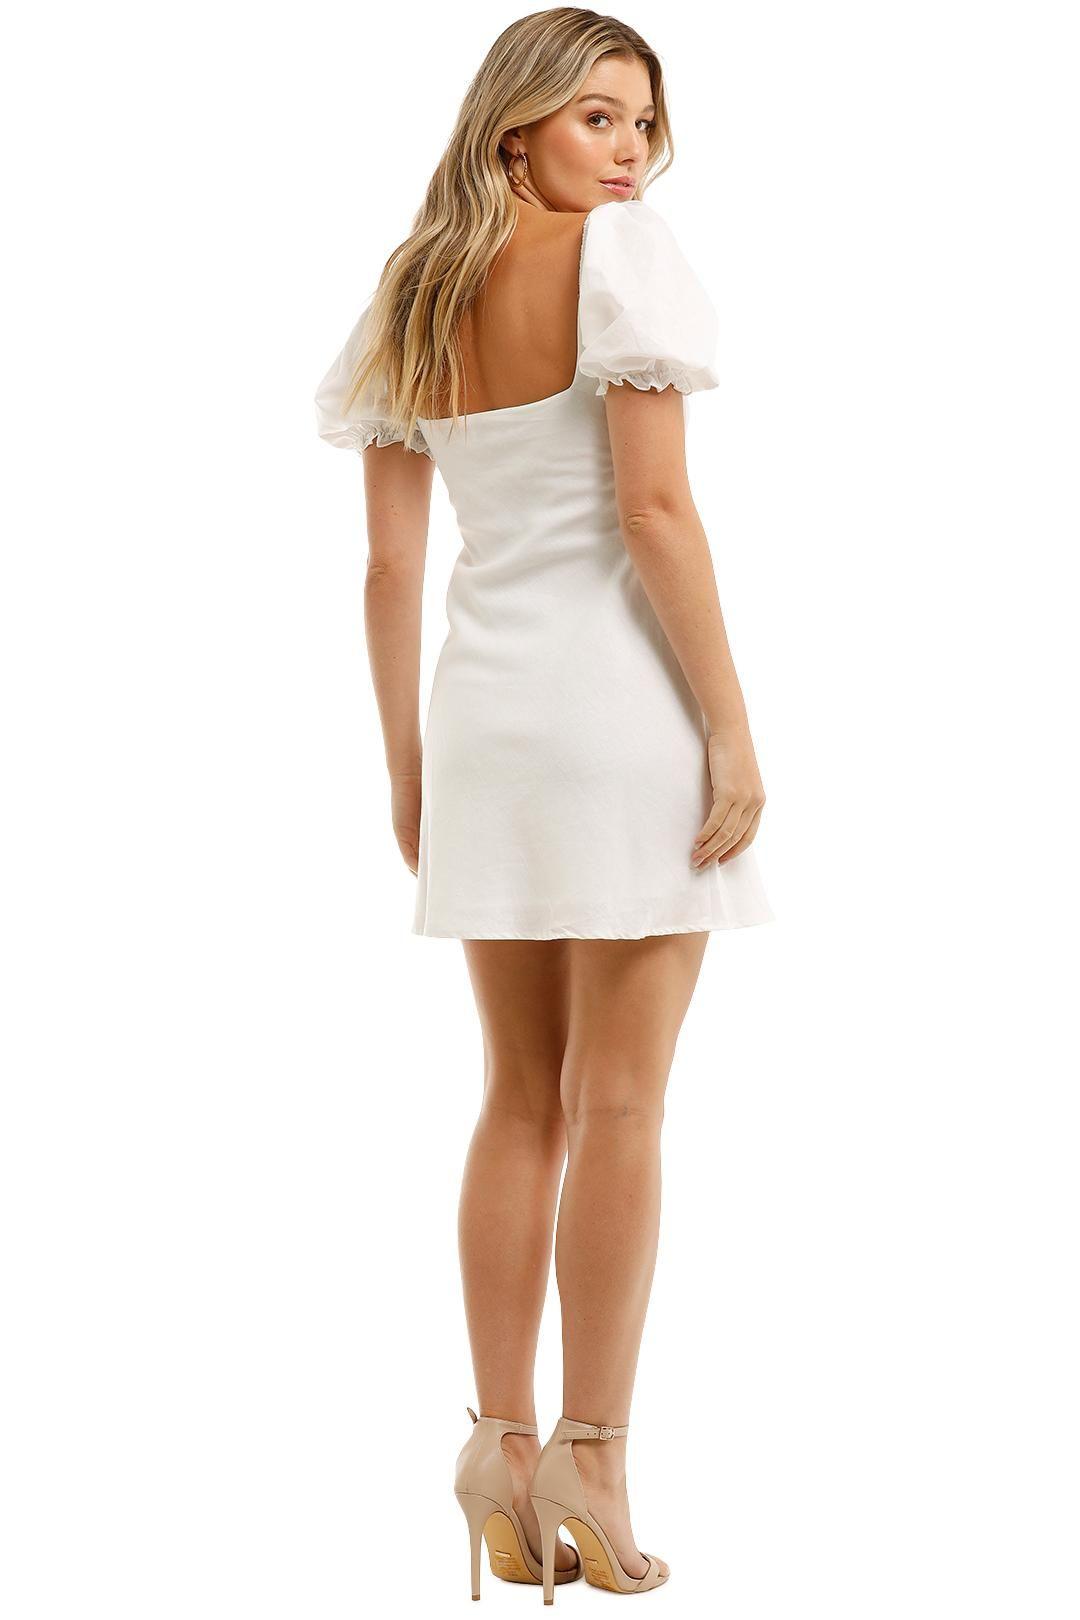 Charlie Holiday Lottie Mini Dress Shirred